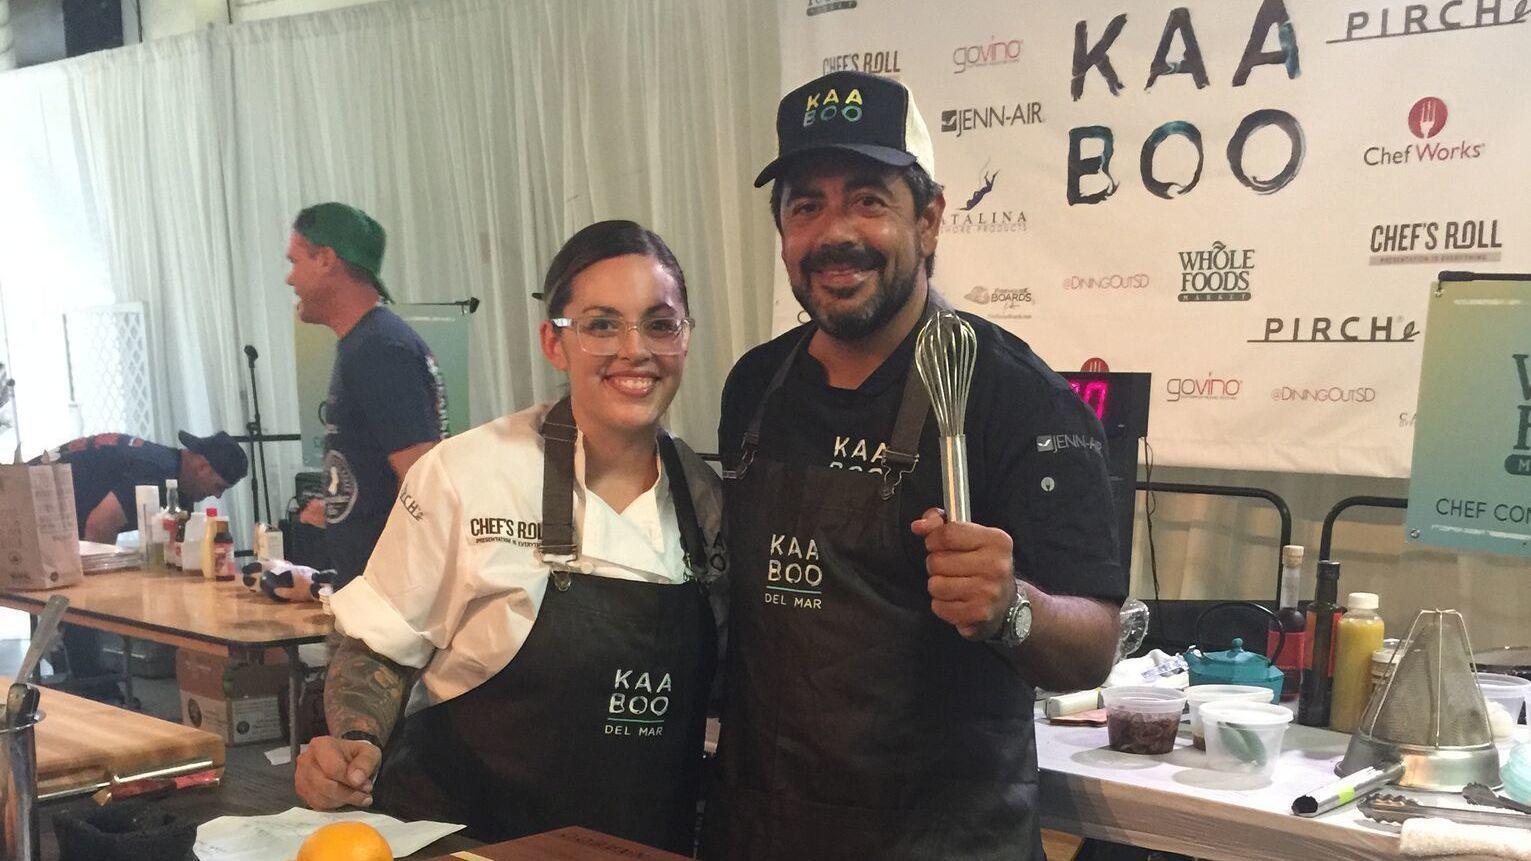 Javier Plascencia to cook at El Jardín for a special Bracero reunion